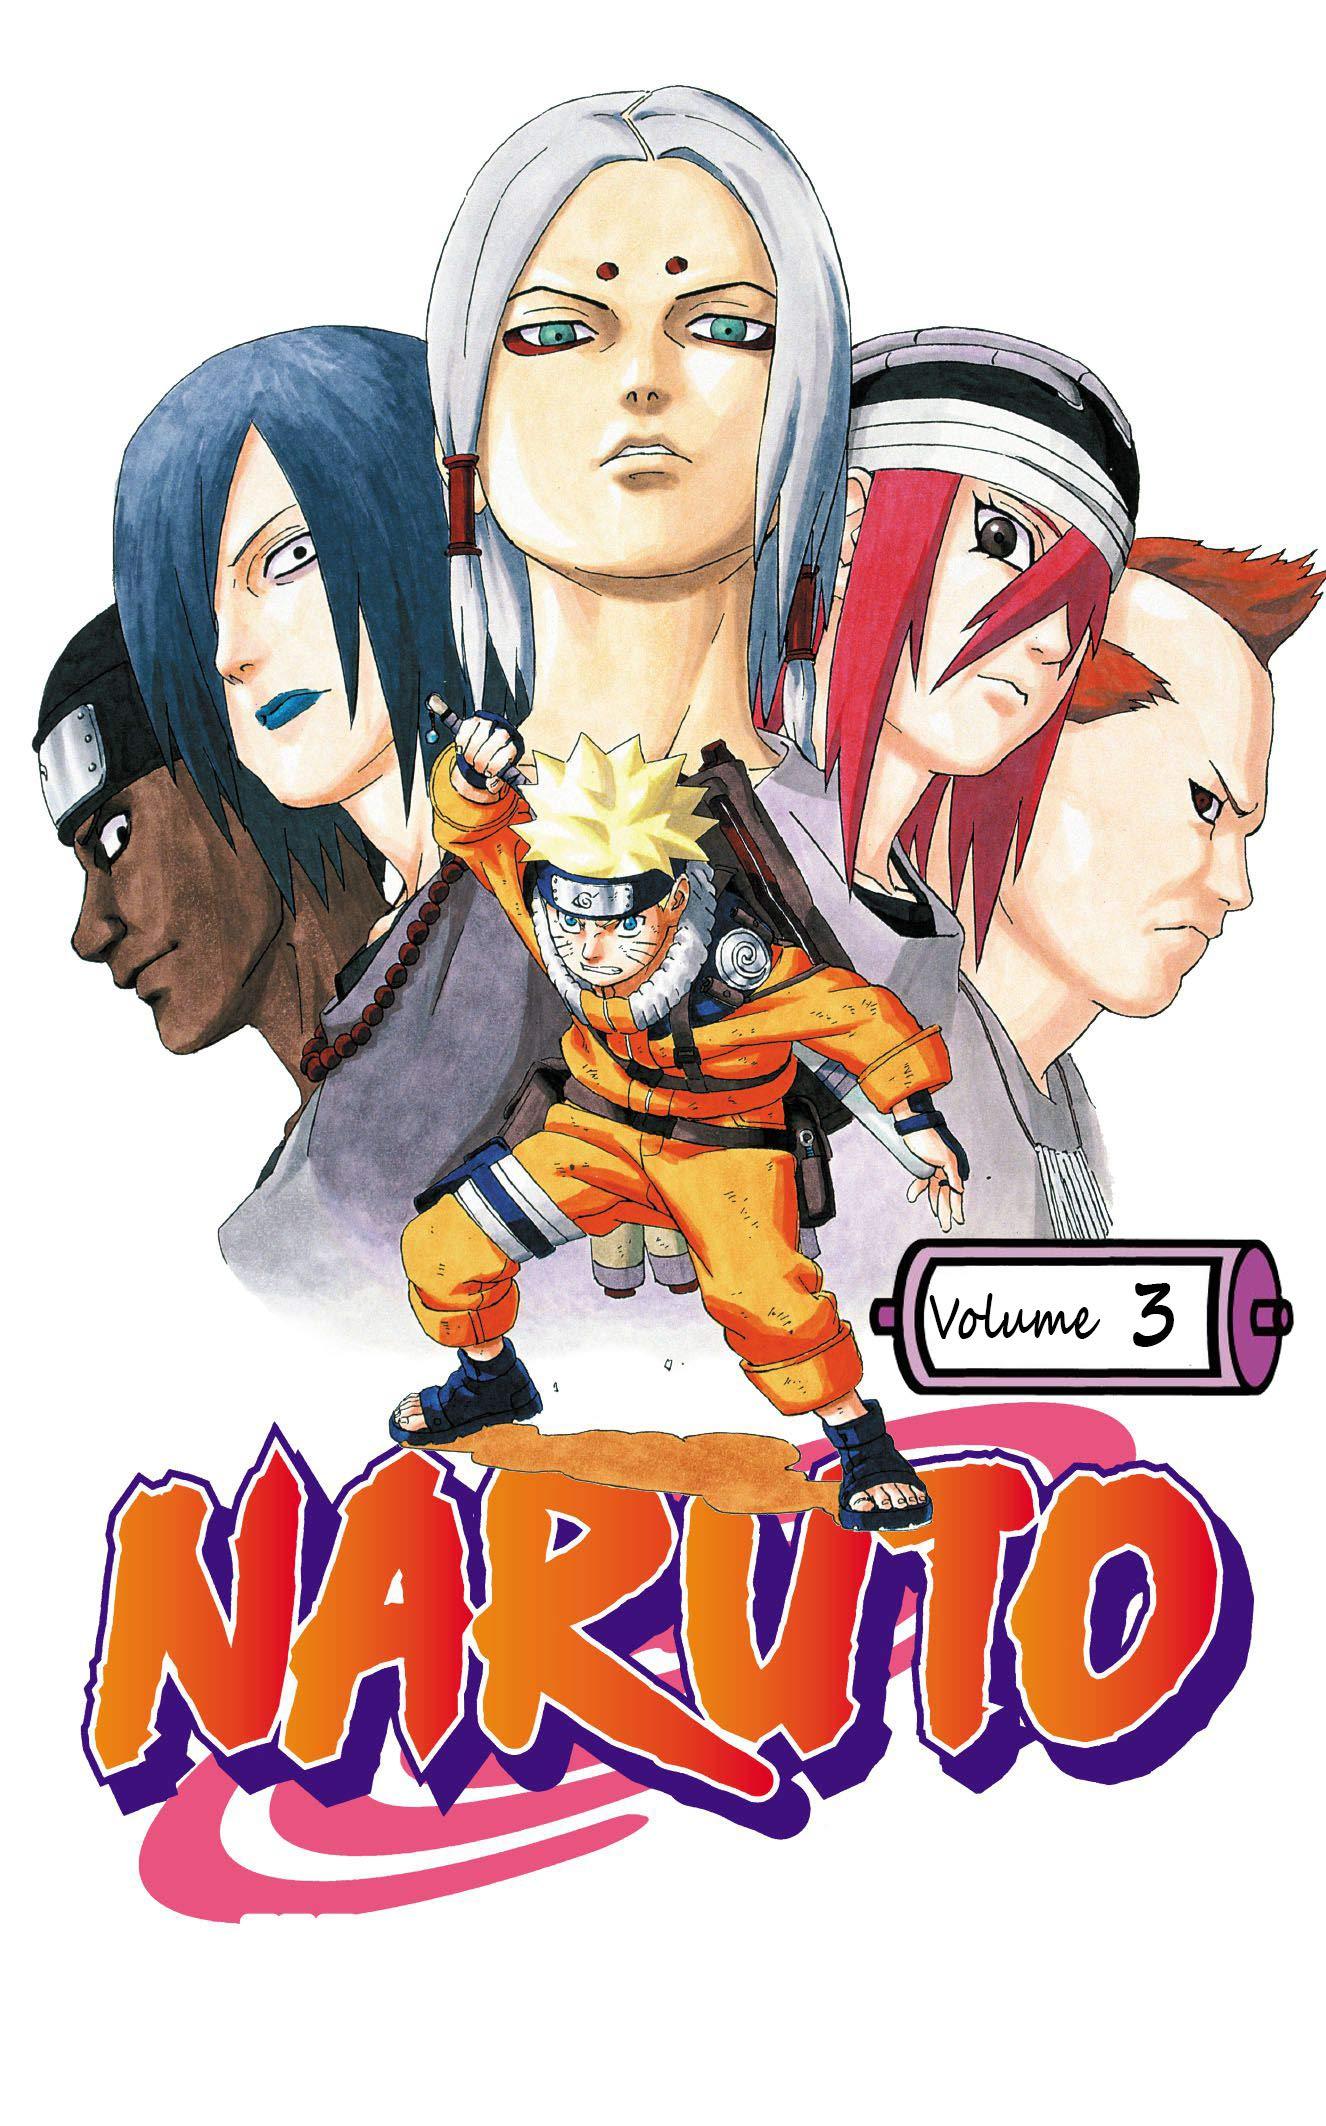 Naruto Uzumaki: Volume 3